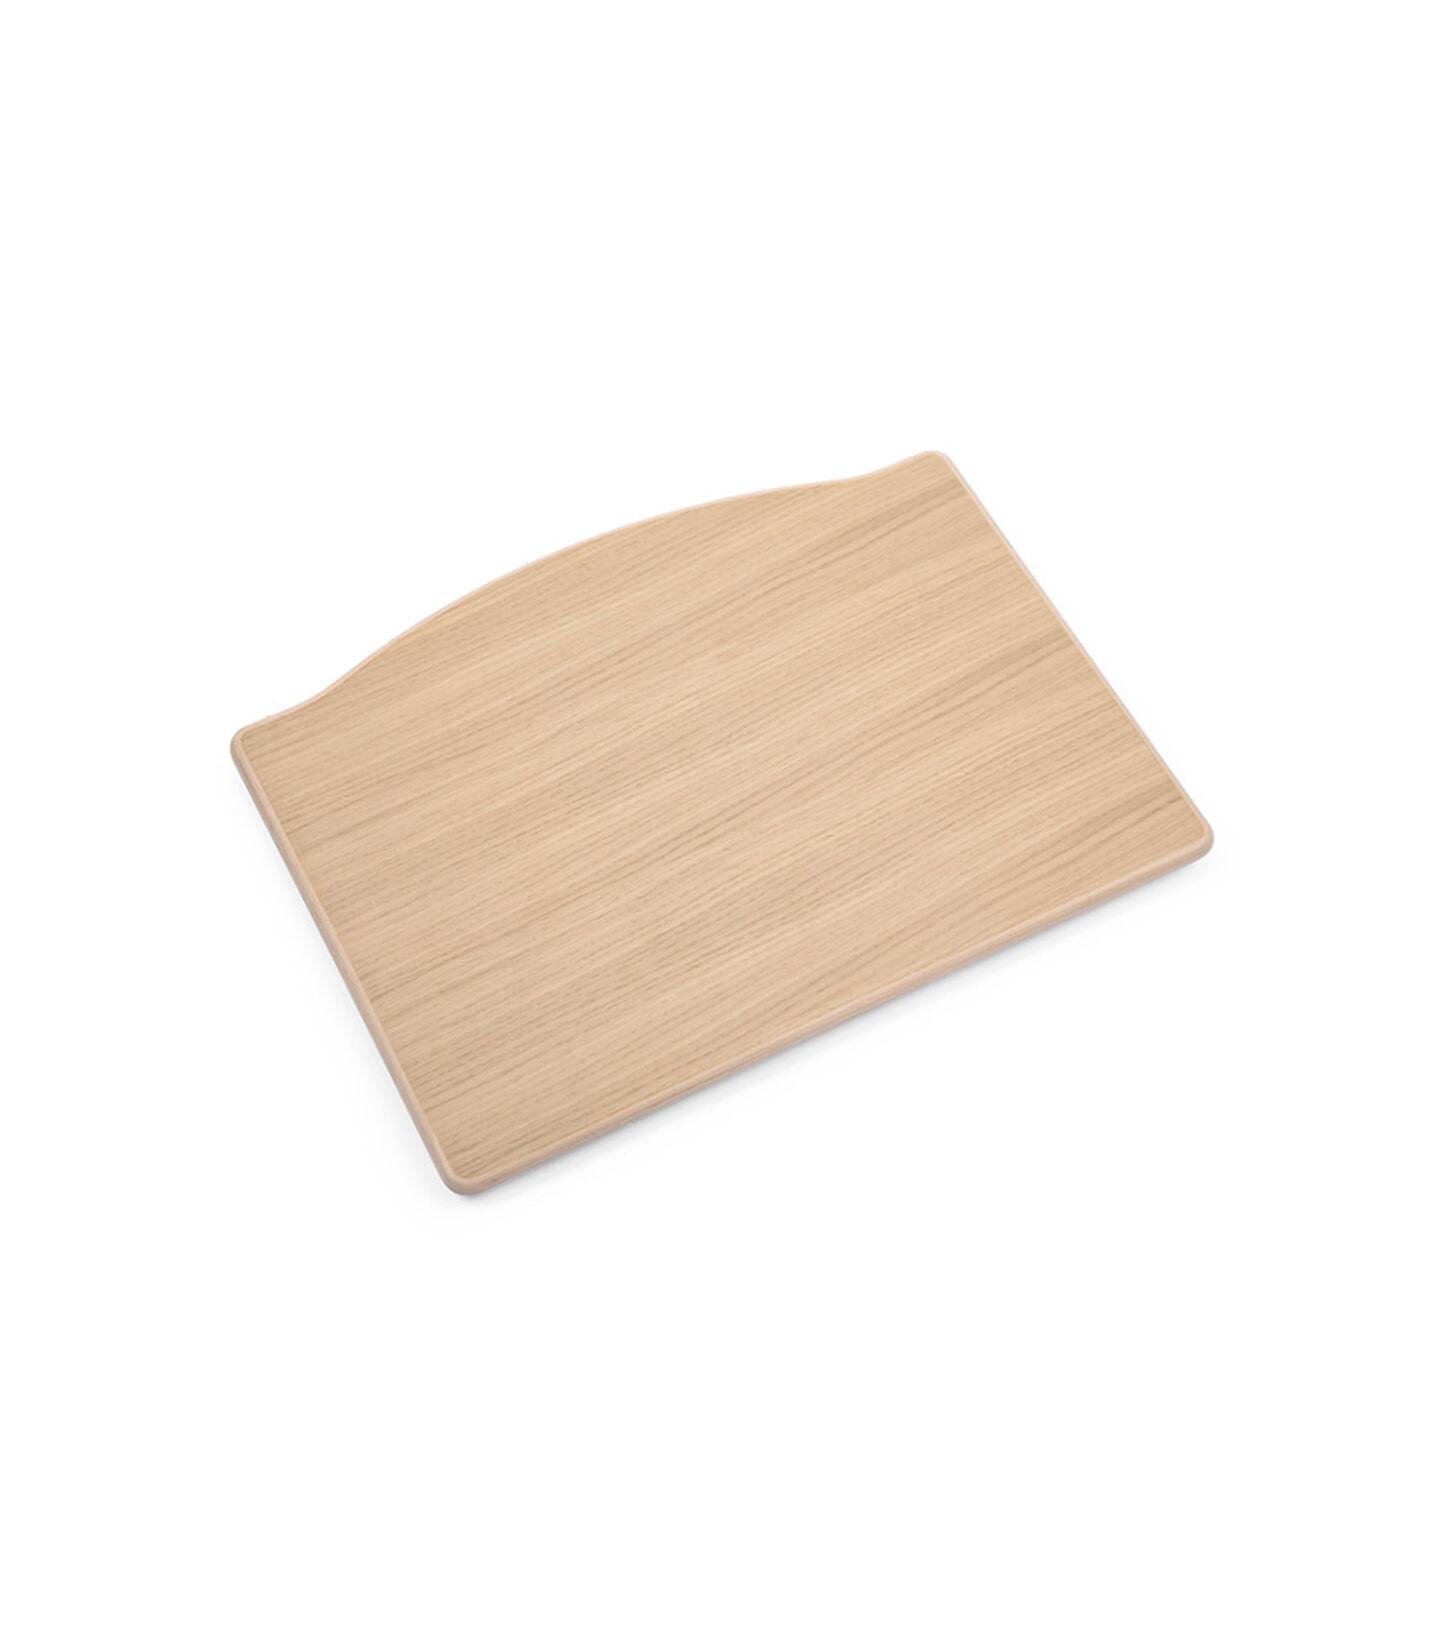 Tripp Trapp® Footplate Oak White, Oak Natural, mainview view 1